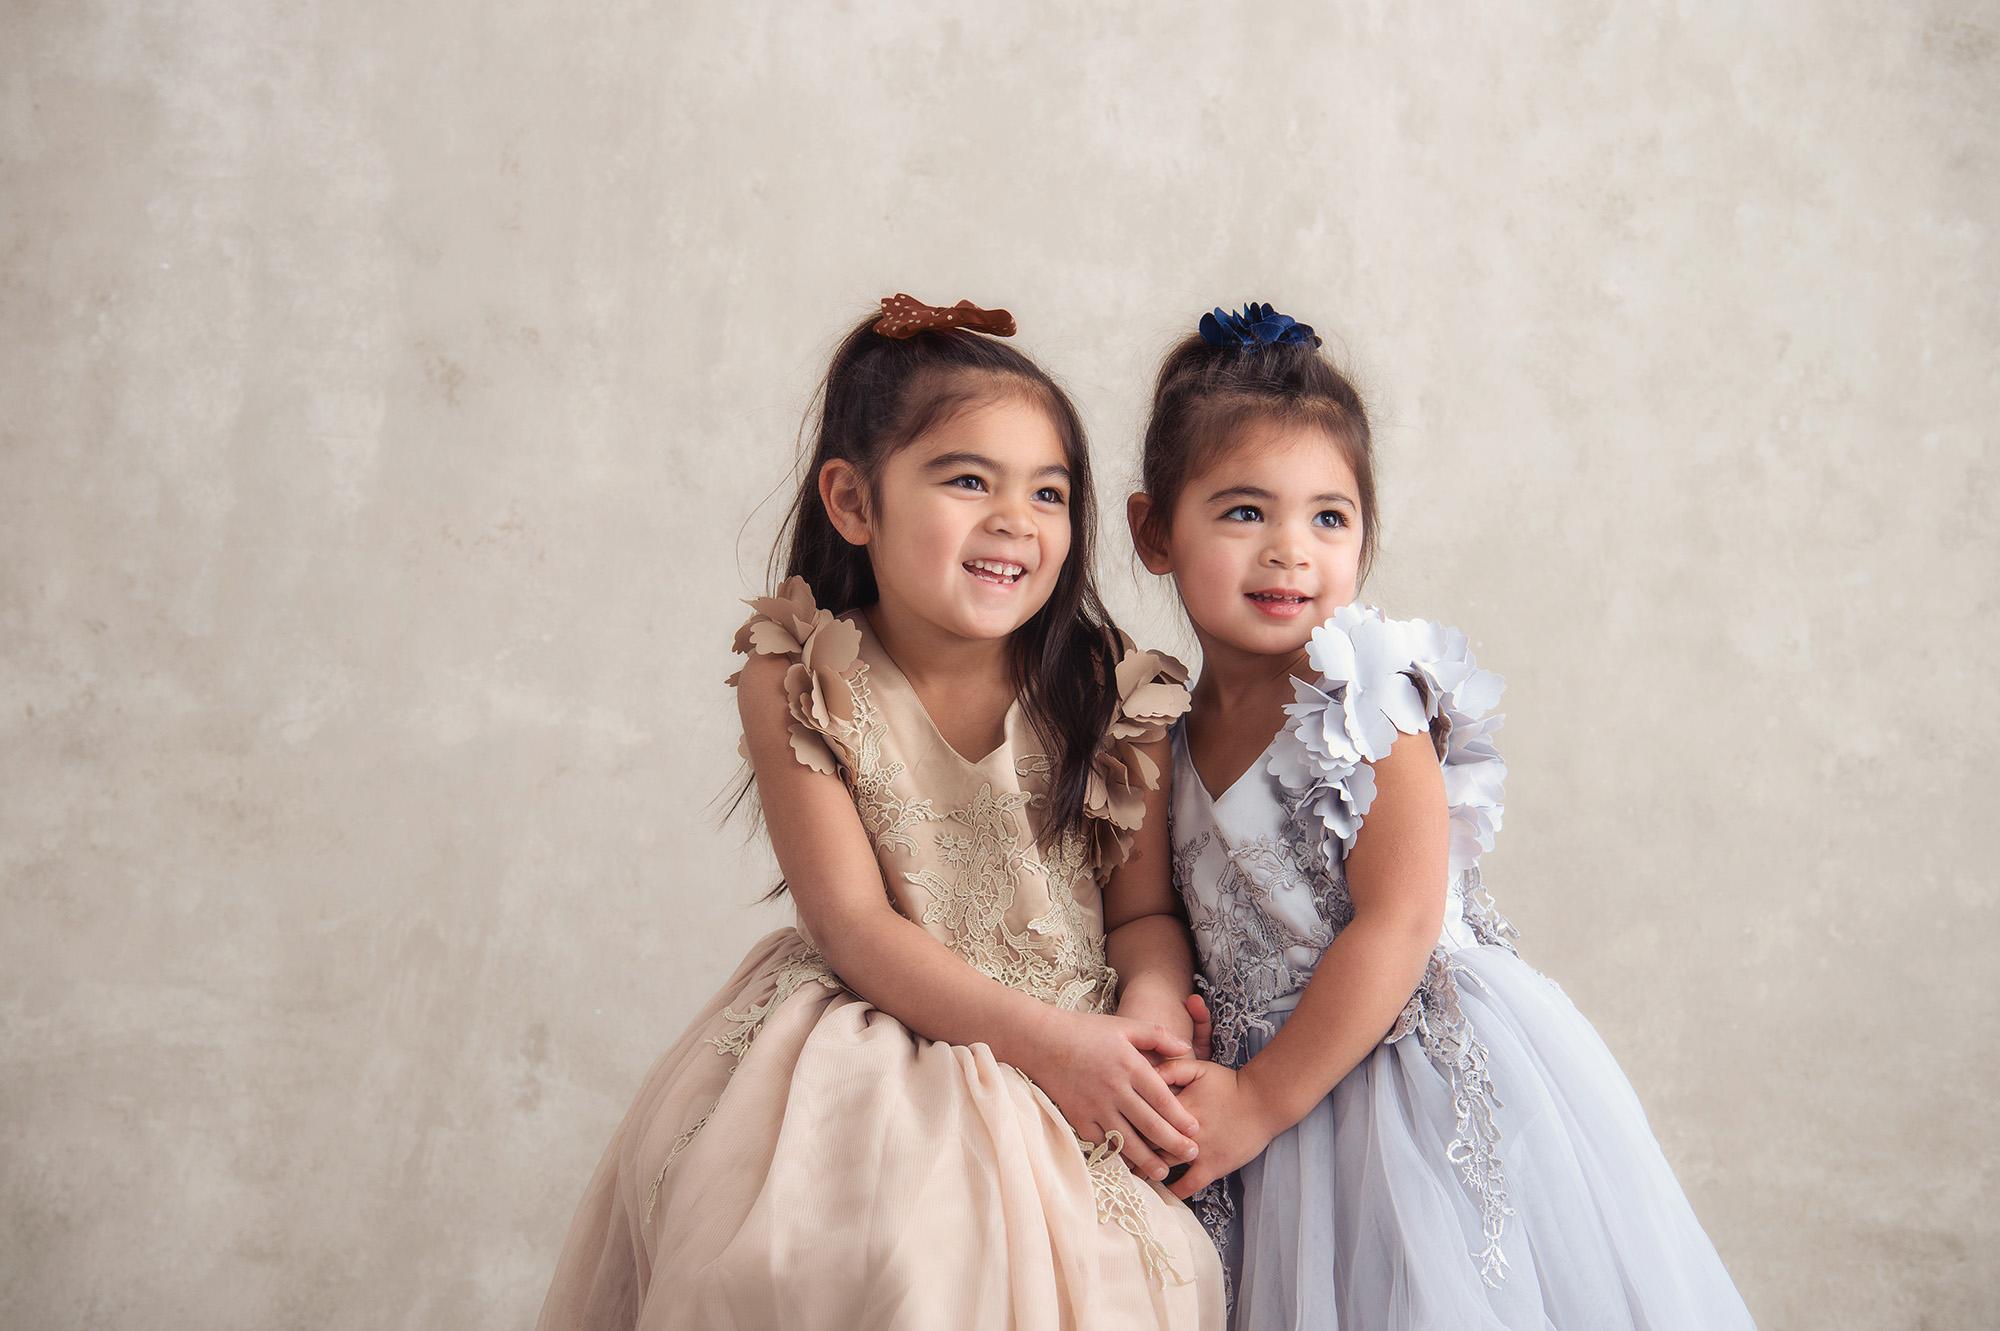 Studio B Portraits_sisters in formal dresses for holidays.jpg